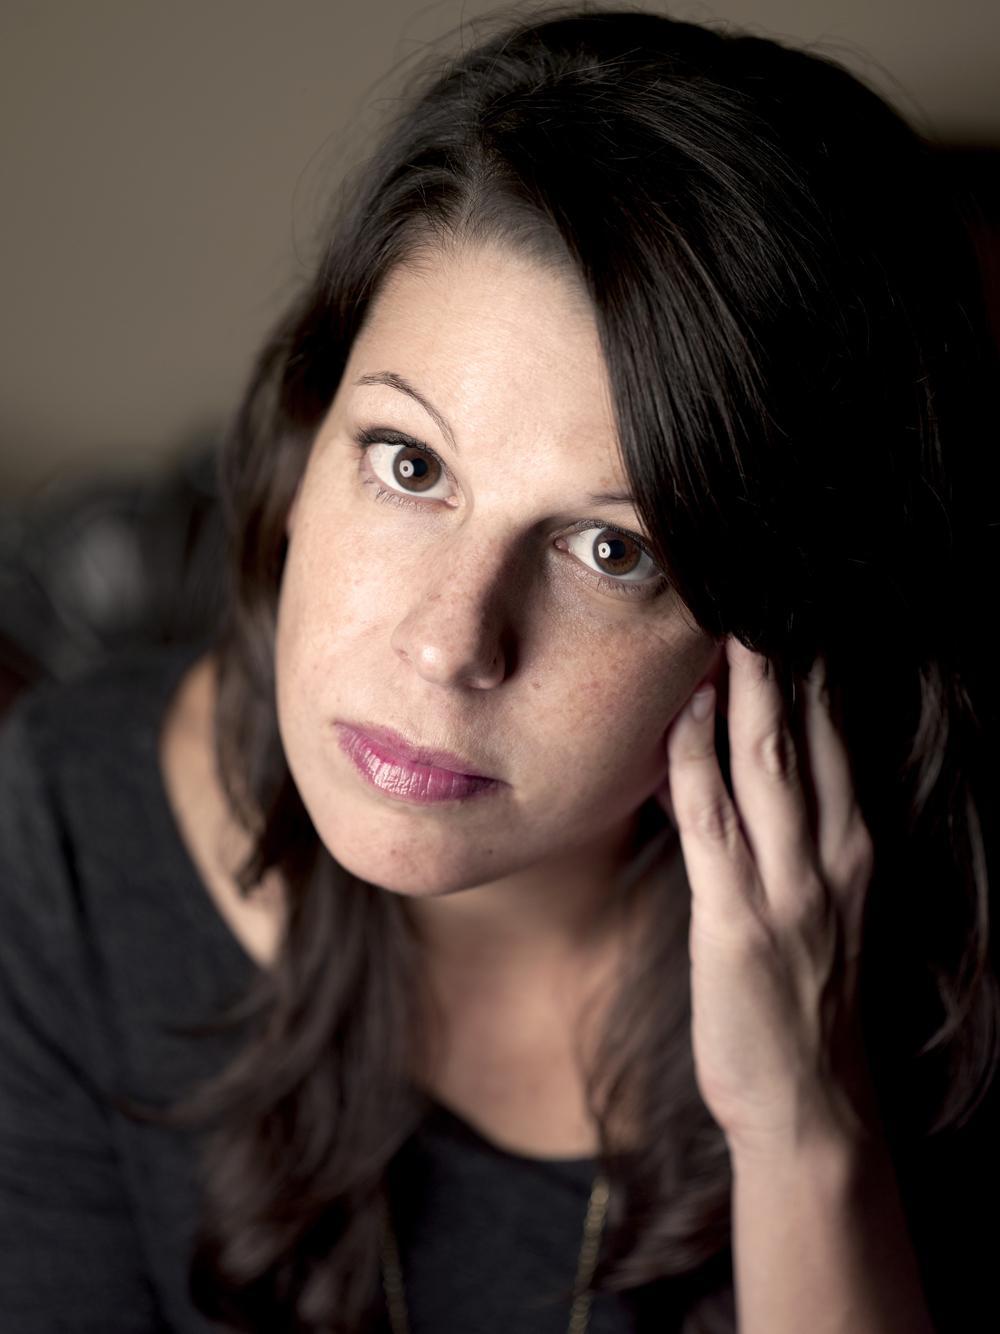 Jessica Lott's previous work includes the 2007 novella, Osin.